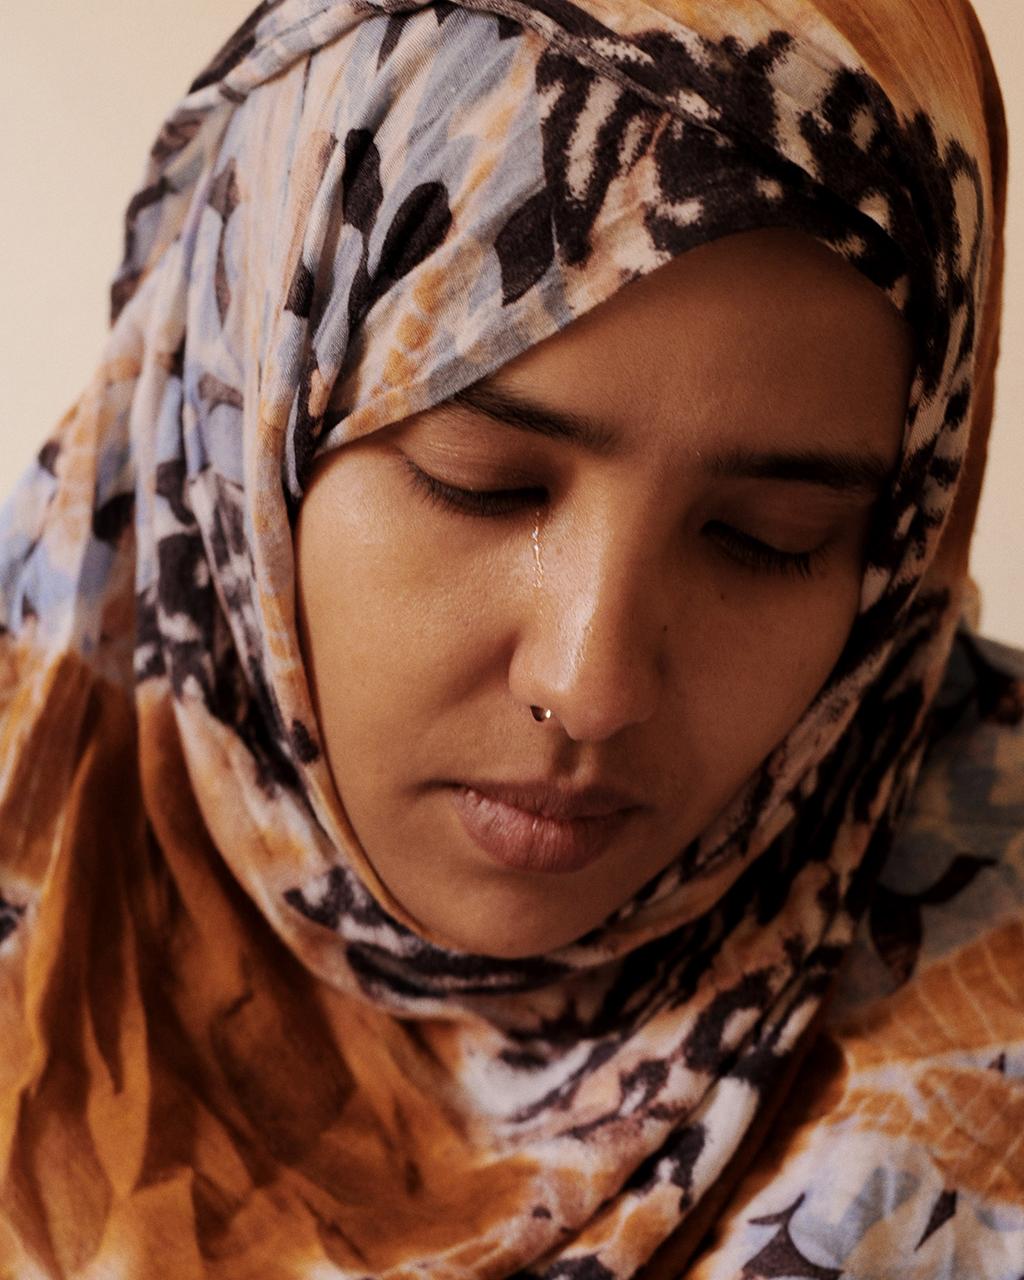 Laayoune, <b>Sahara Occidentale</b>, 2012, Leila Dambar, sorella di Said Dambar, <b>...</b> - 2012-10-08-ghizzoni_05